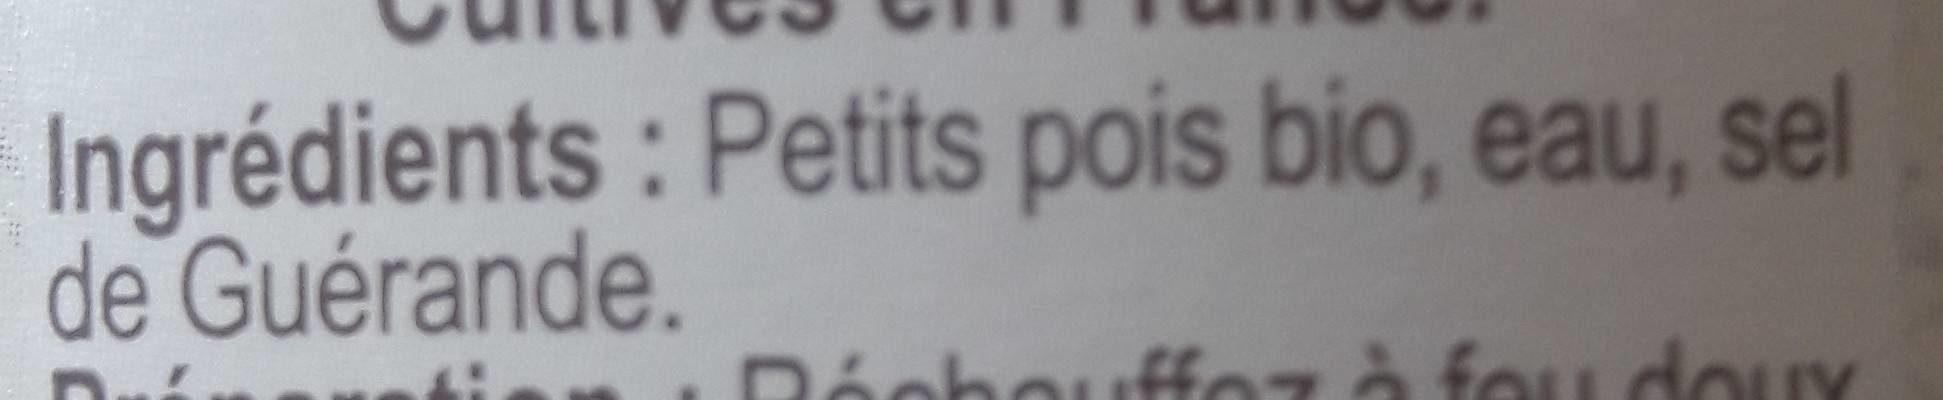 Petits pois extra-fins - Ingrédients - fr